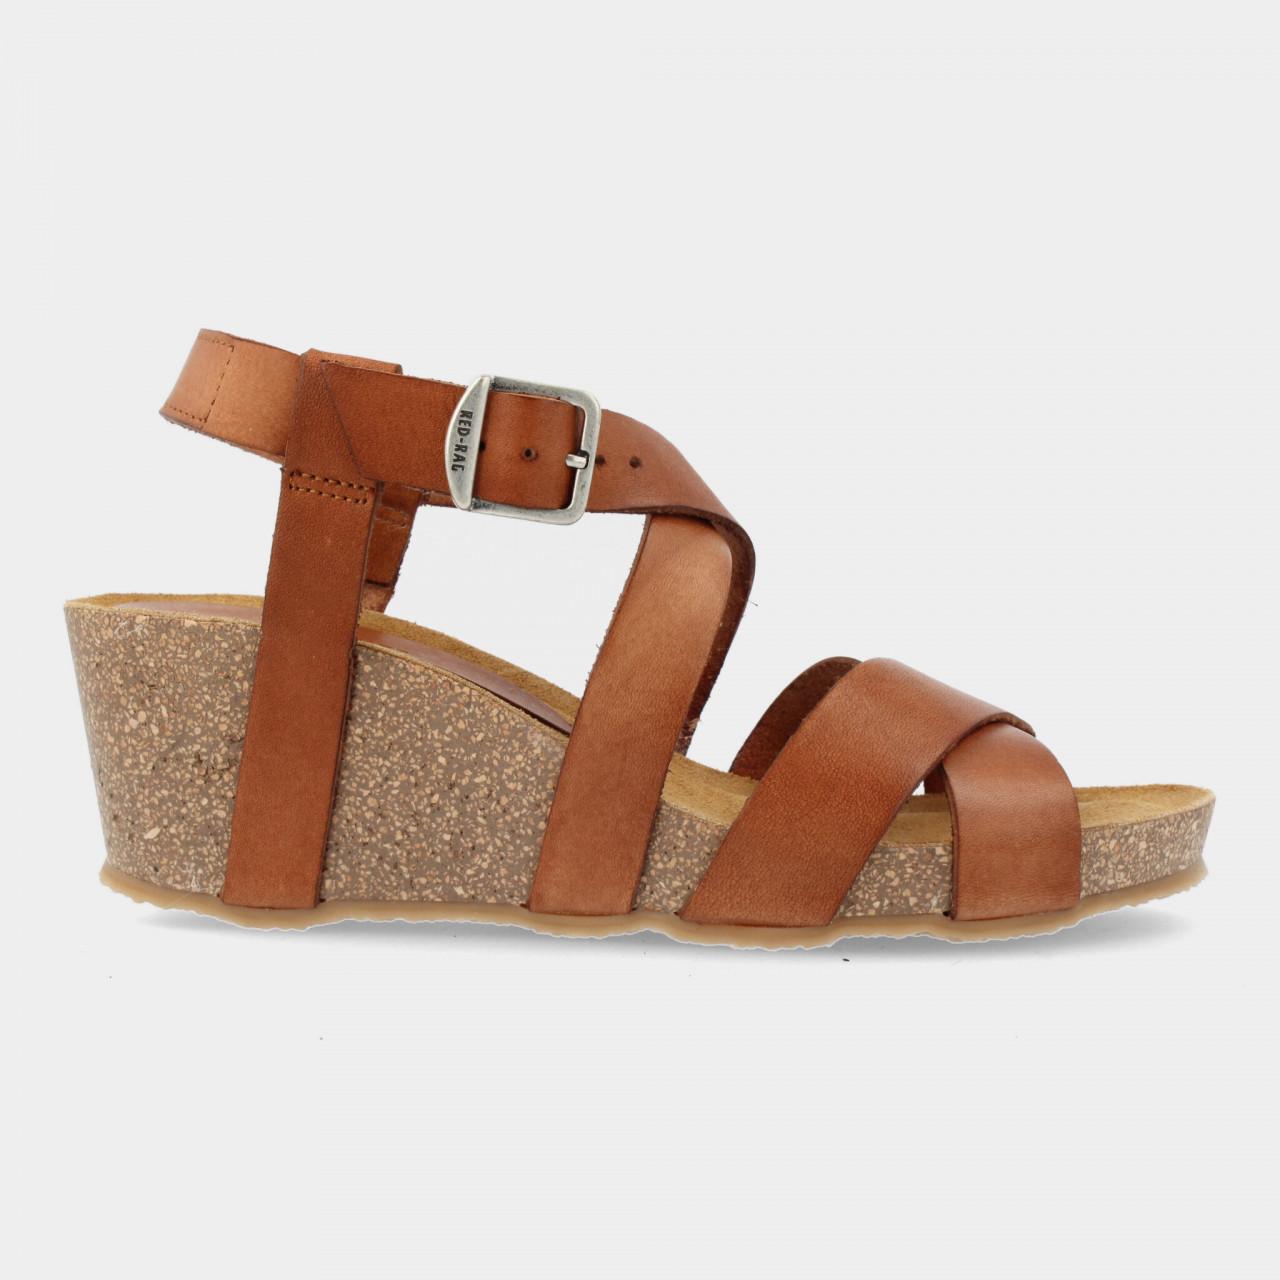 79248 | Women Sandal Wedge